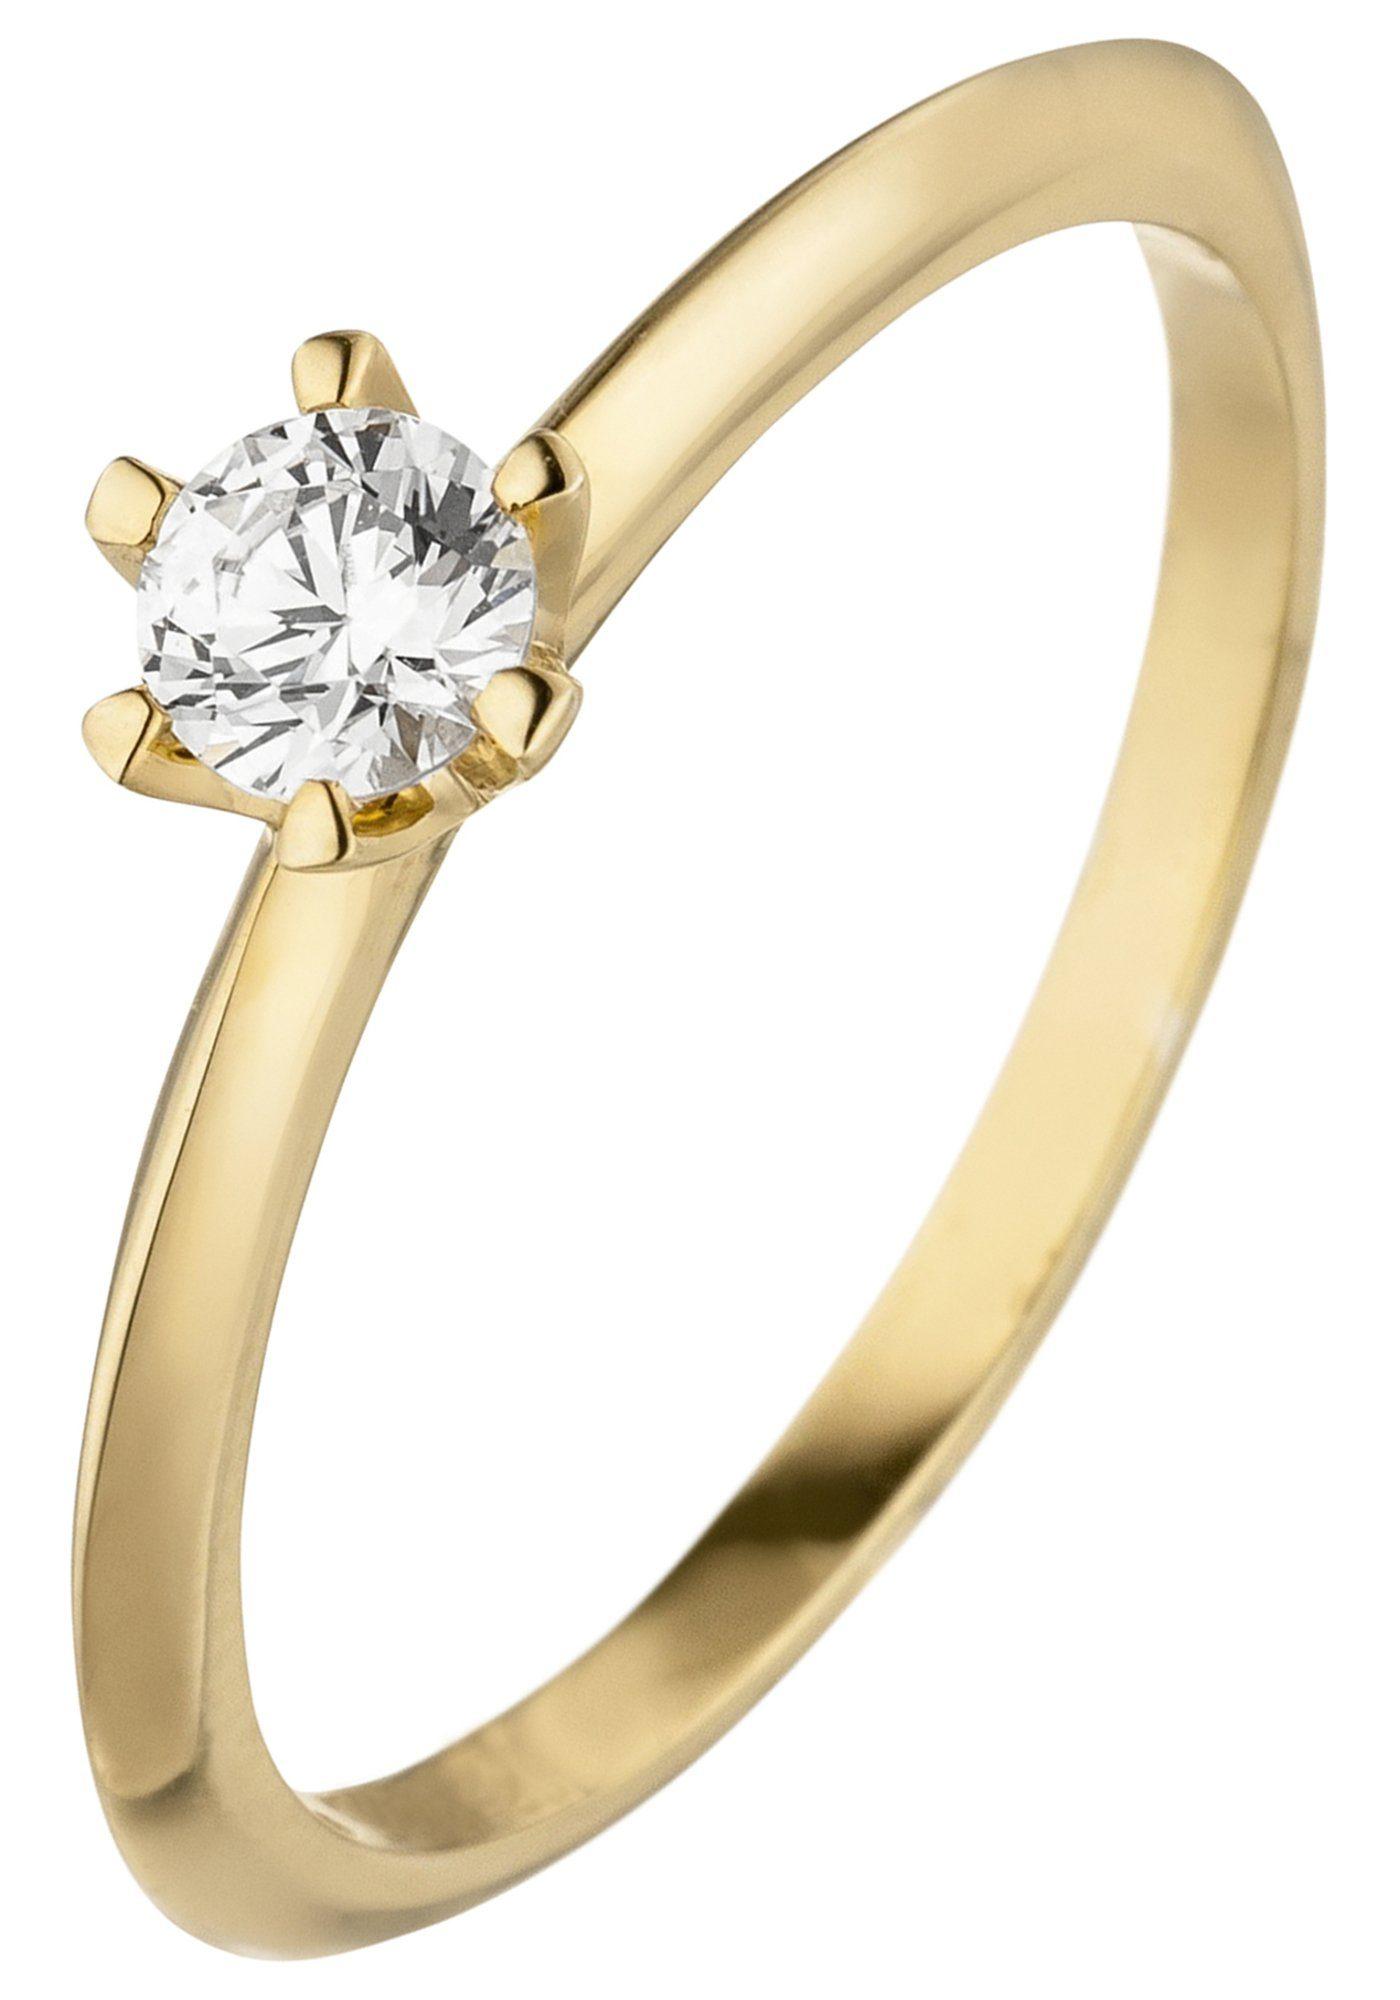 JOBO Solitärring 585 Gold mit 1 Diamant Brillant 0,15 ct.